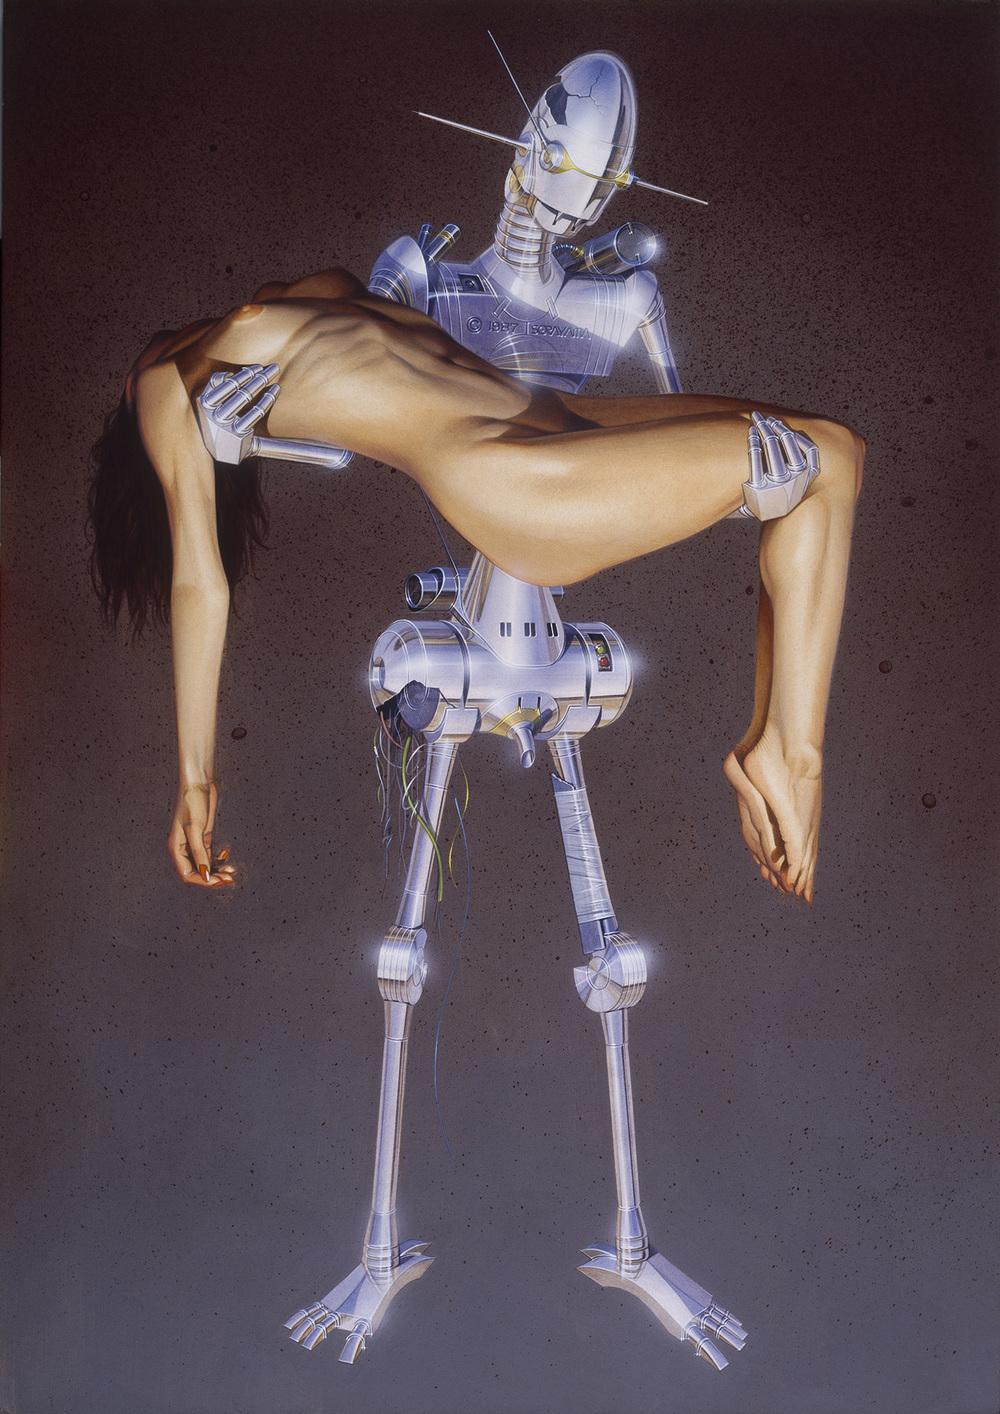 Nude robot woman porn hentai gallery